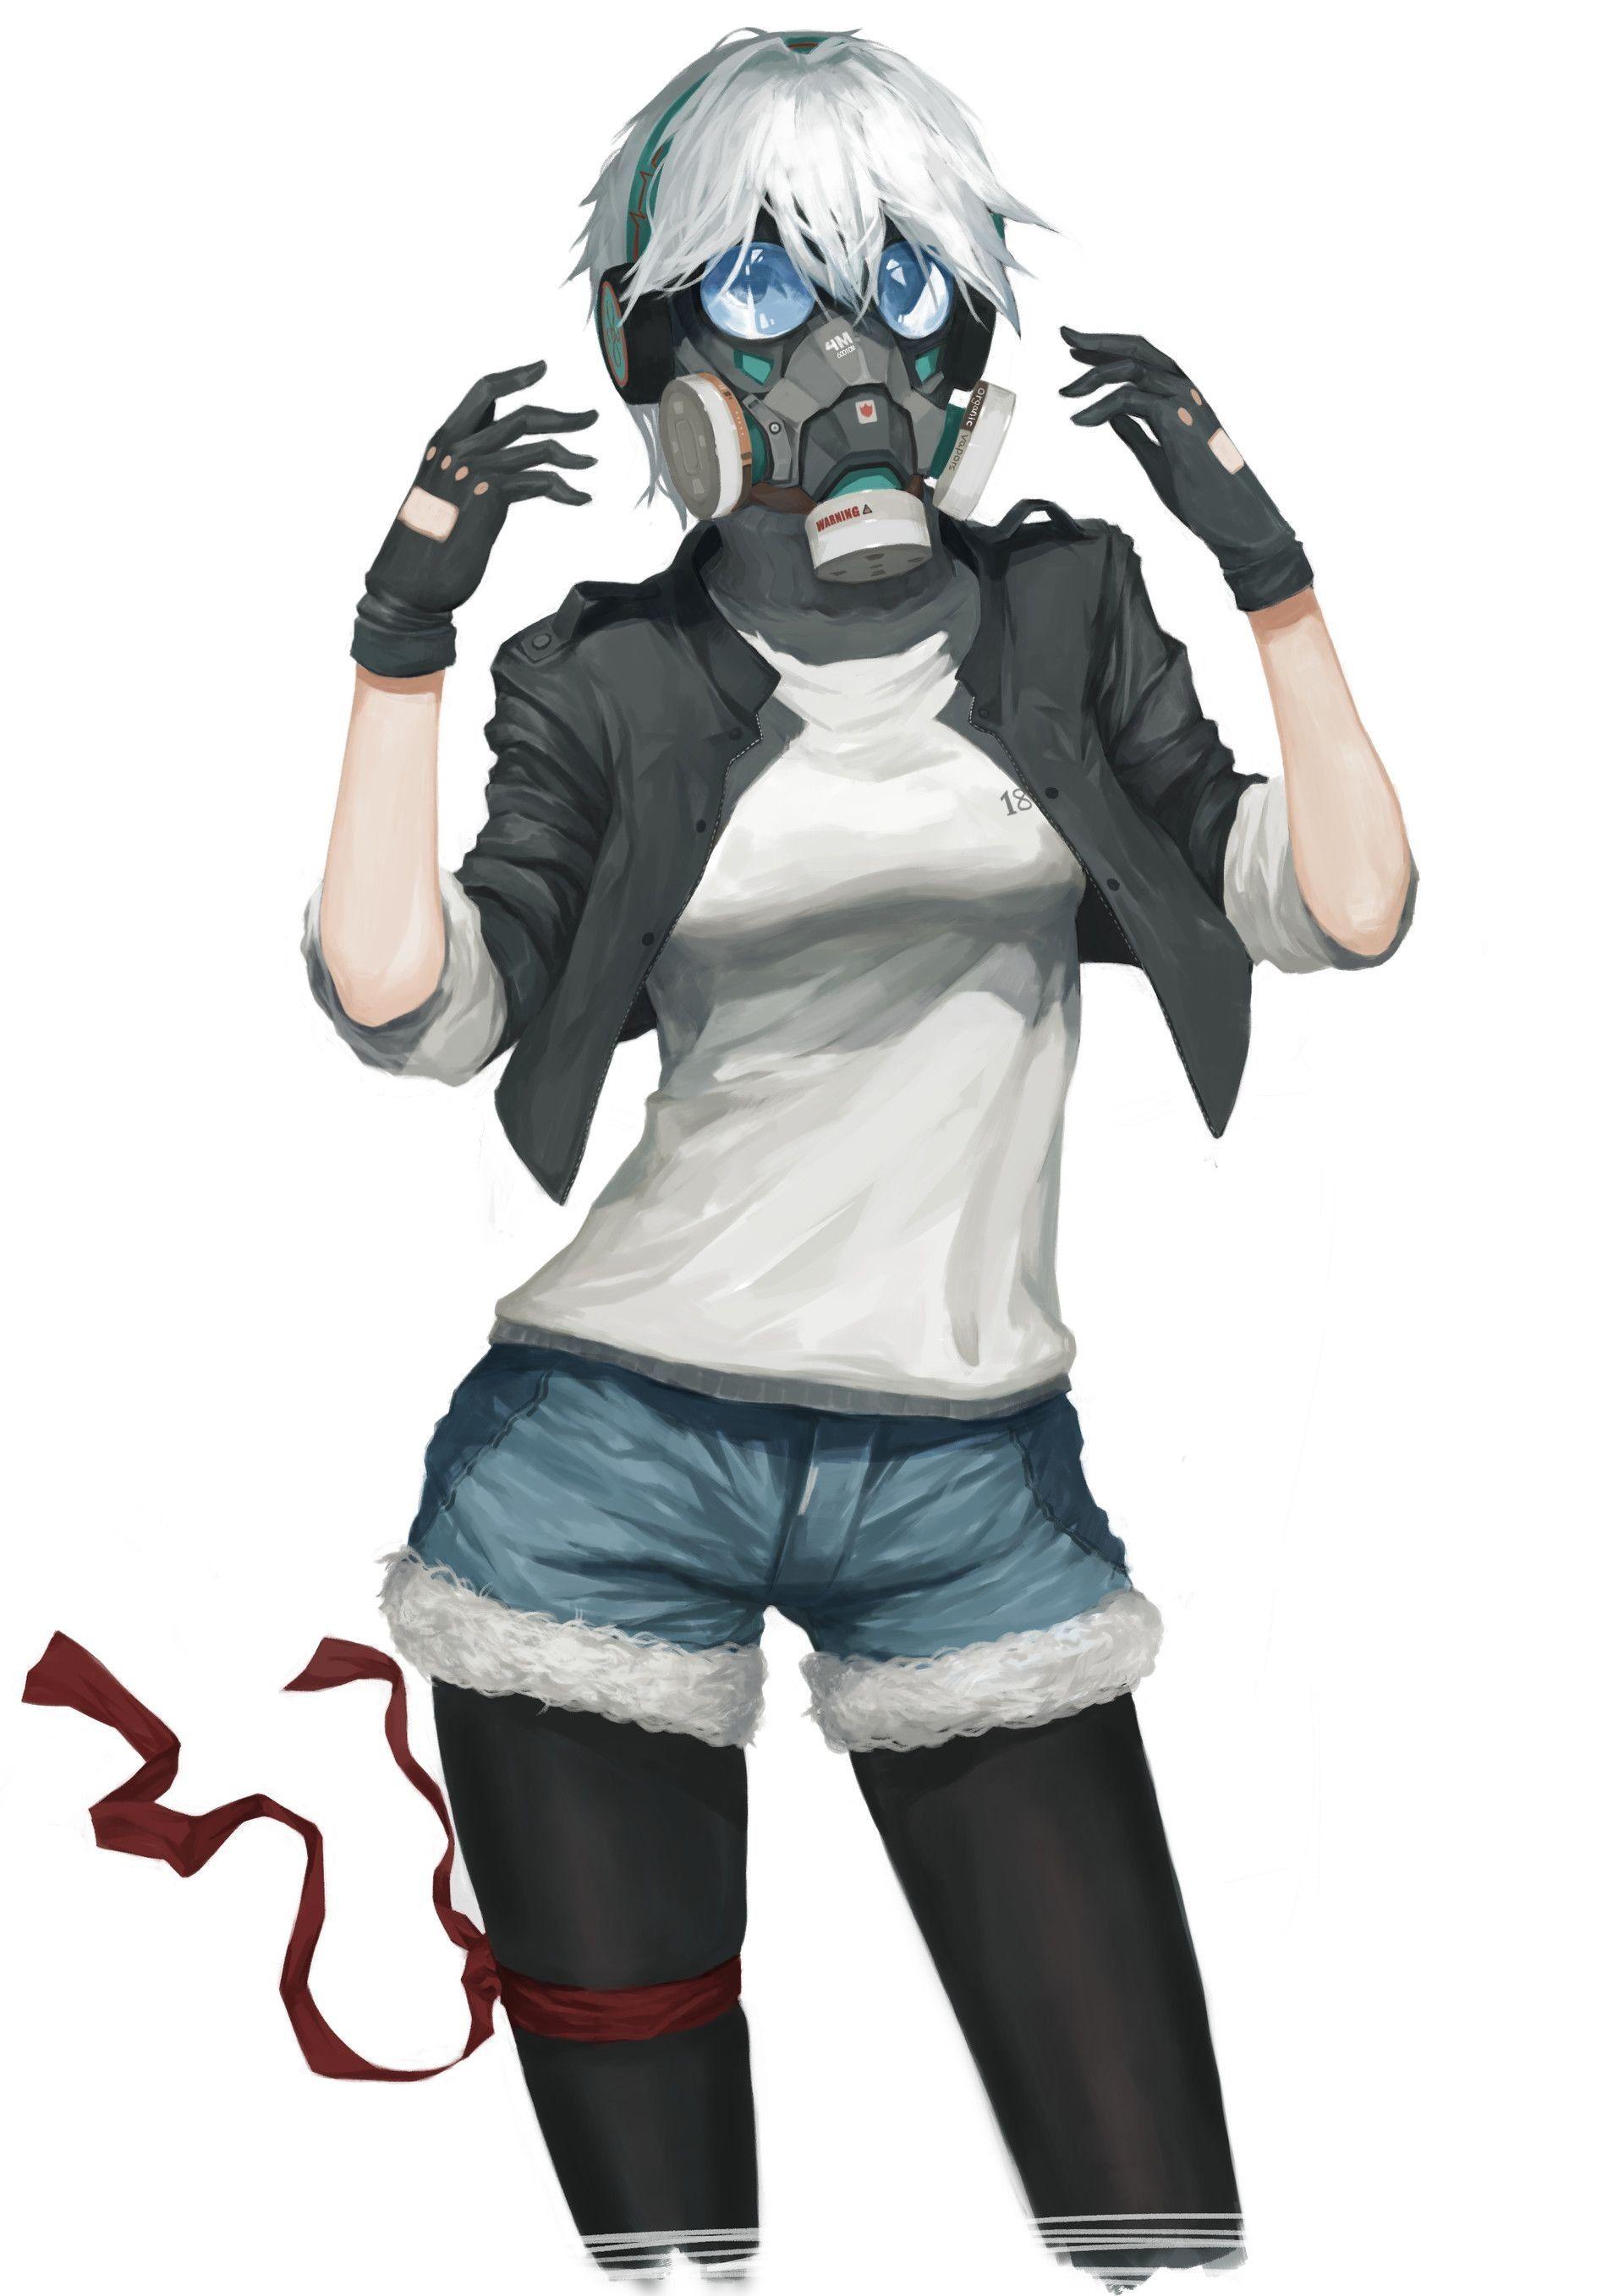 Fresh Masked Anime Characters Gadis Animasi Makhluk Fantasi Animasi